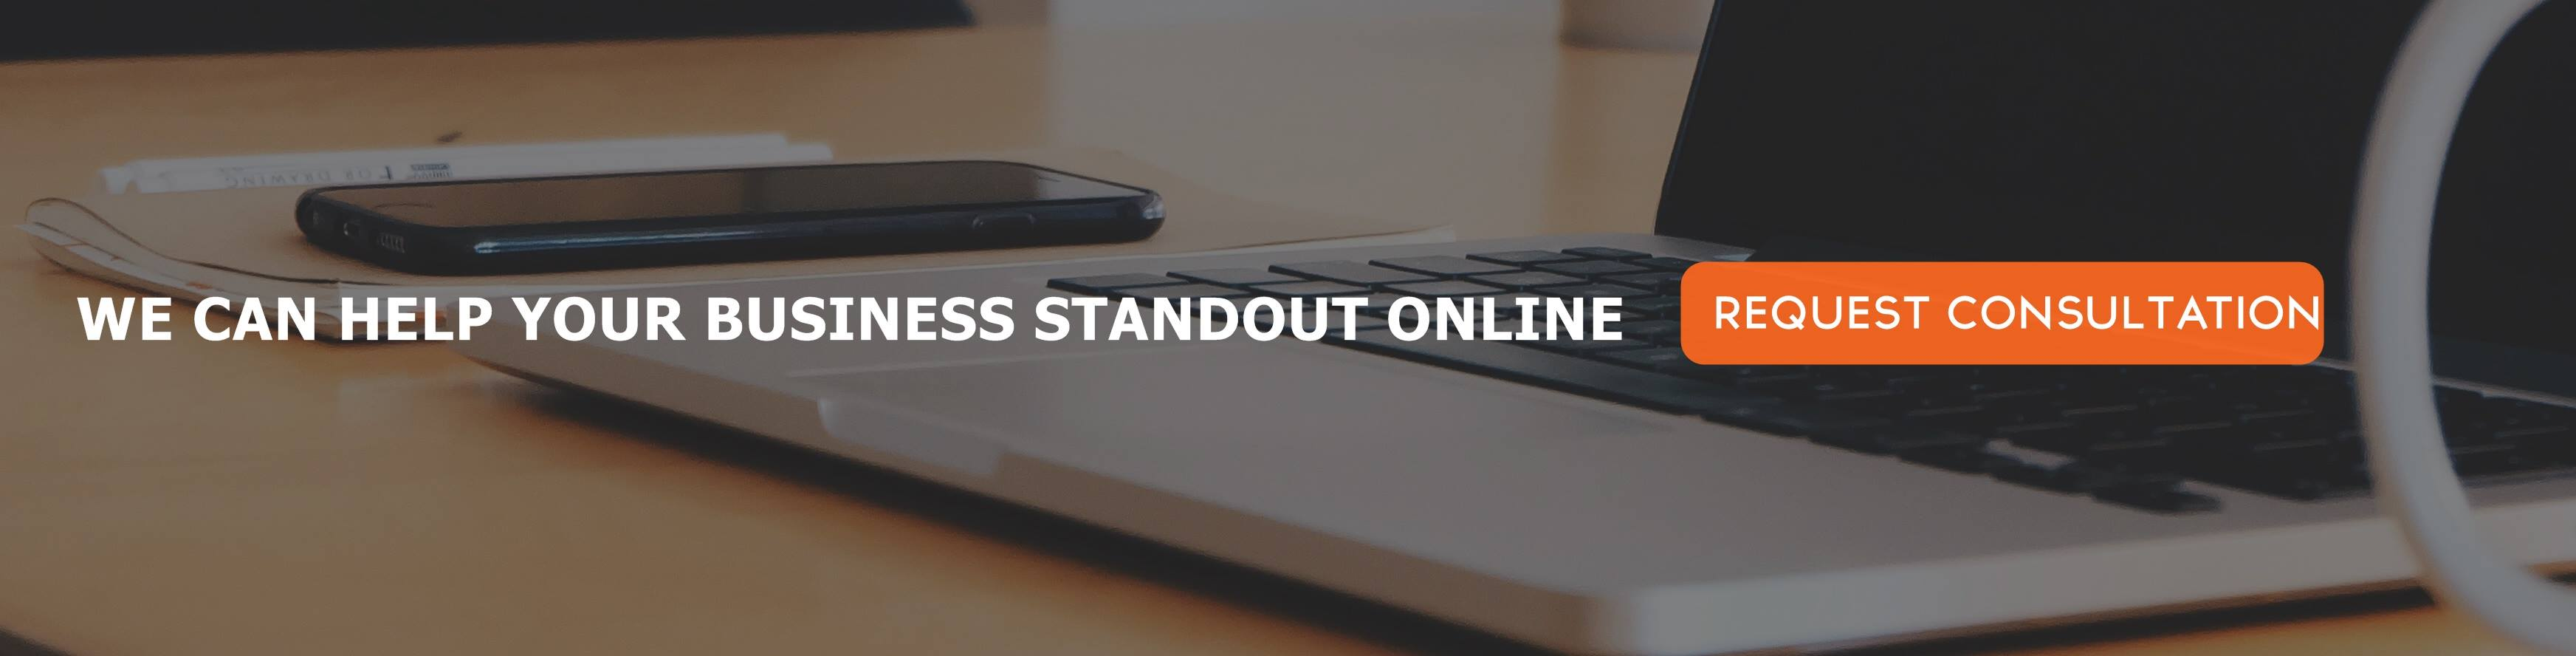 online job free consultation